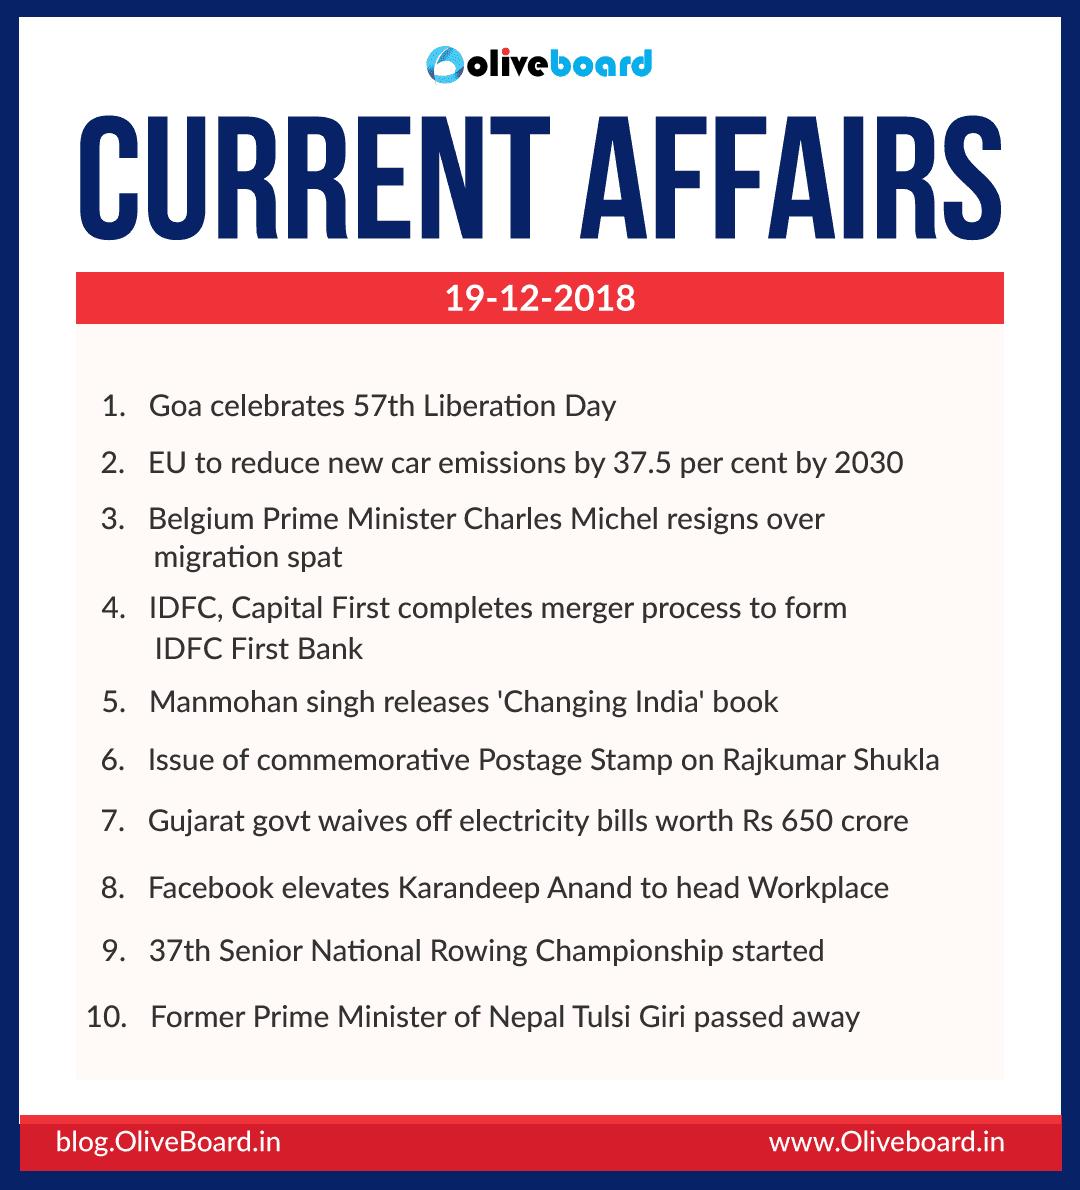 Current Affairs: 19 December 2018